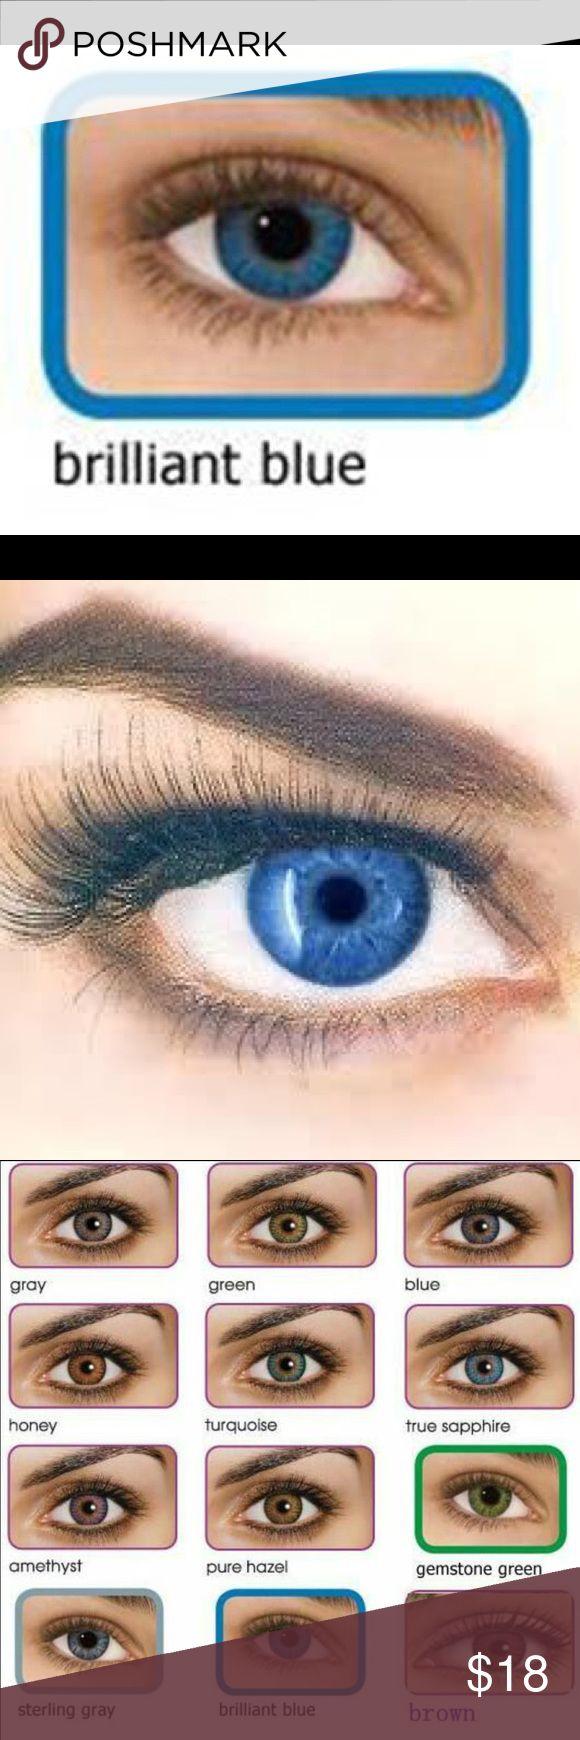 26 Best My Posh Closet Images On Pinterest  Eye Colors -7567